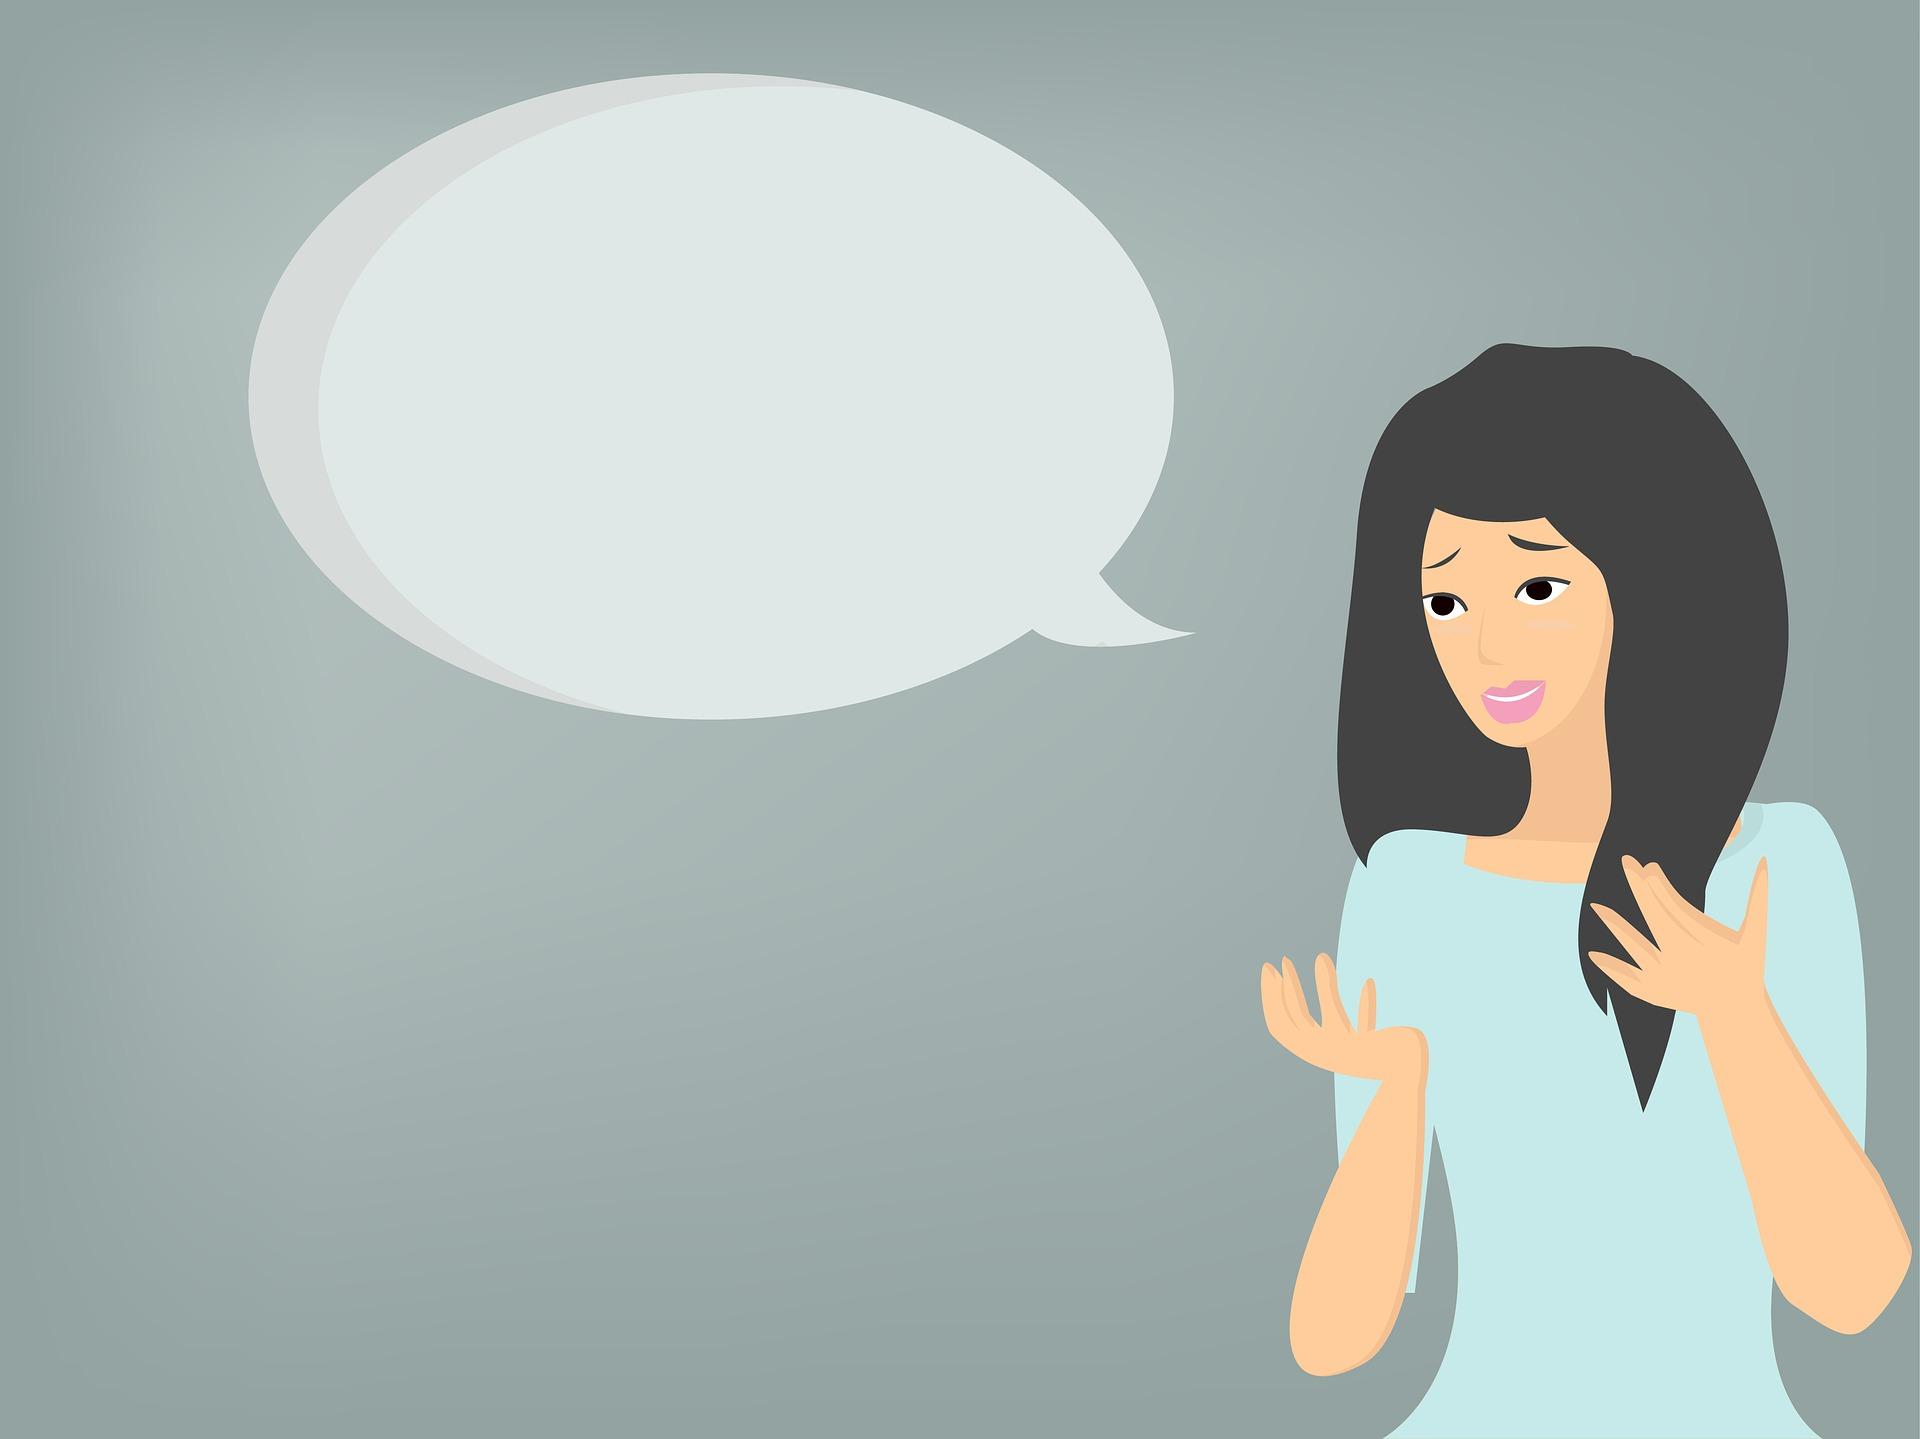 girl-talk-2436539_1920